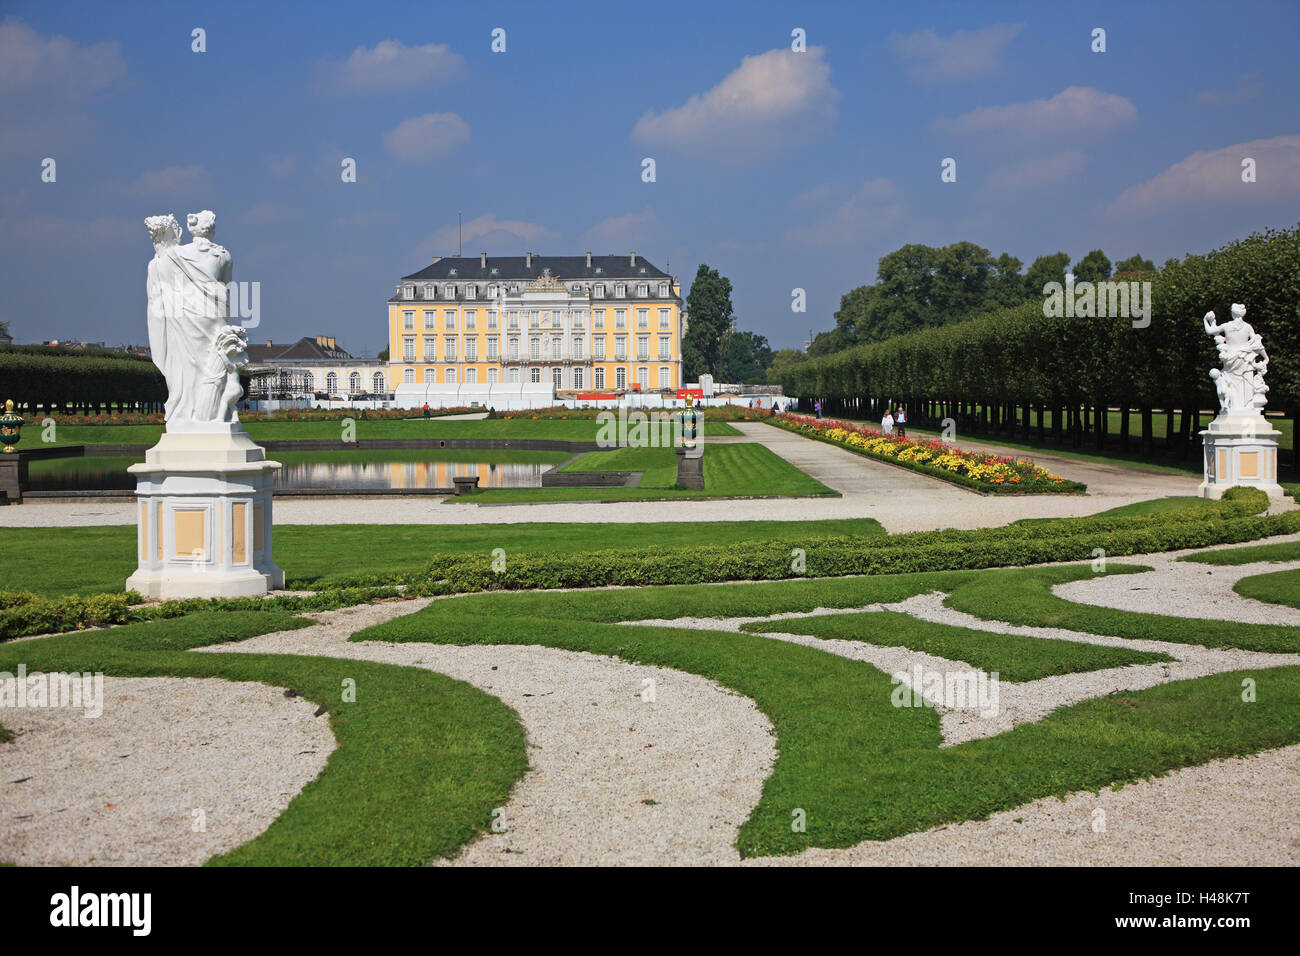 Alemania, en Renania del Norte-Westfalia, Brühl, Augustusburg (castillo), patrimonio mundial de la UNESCO, Foto de stock